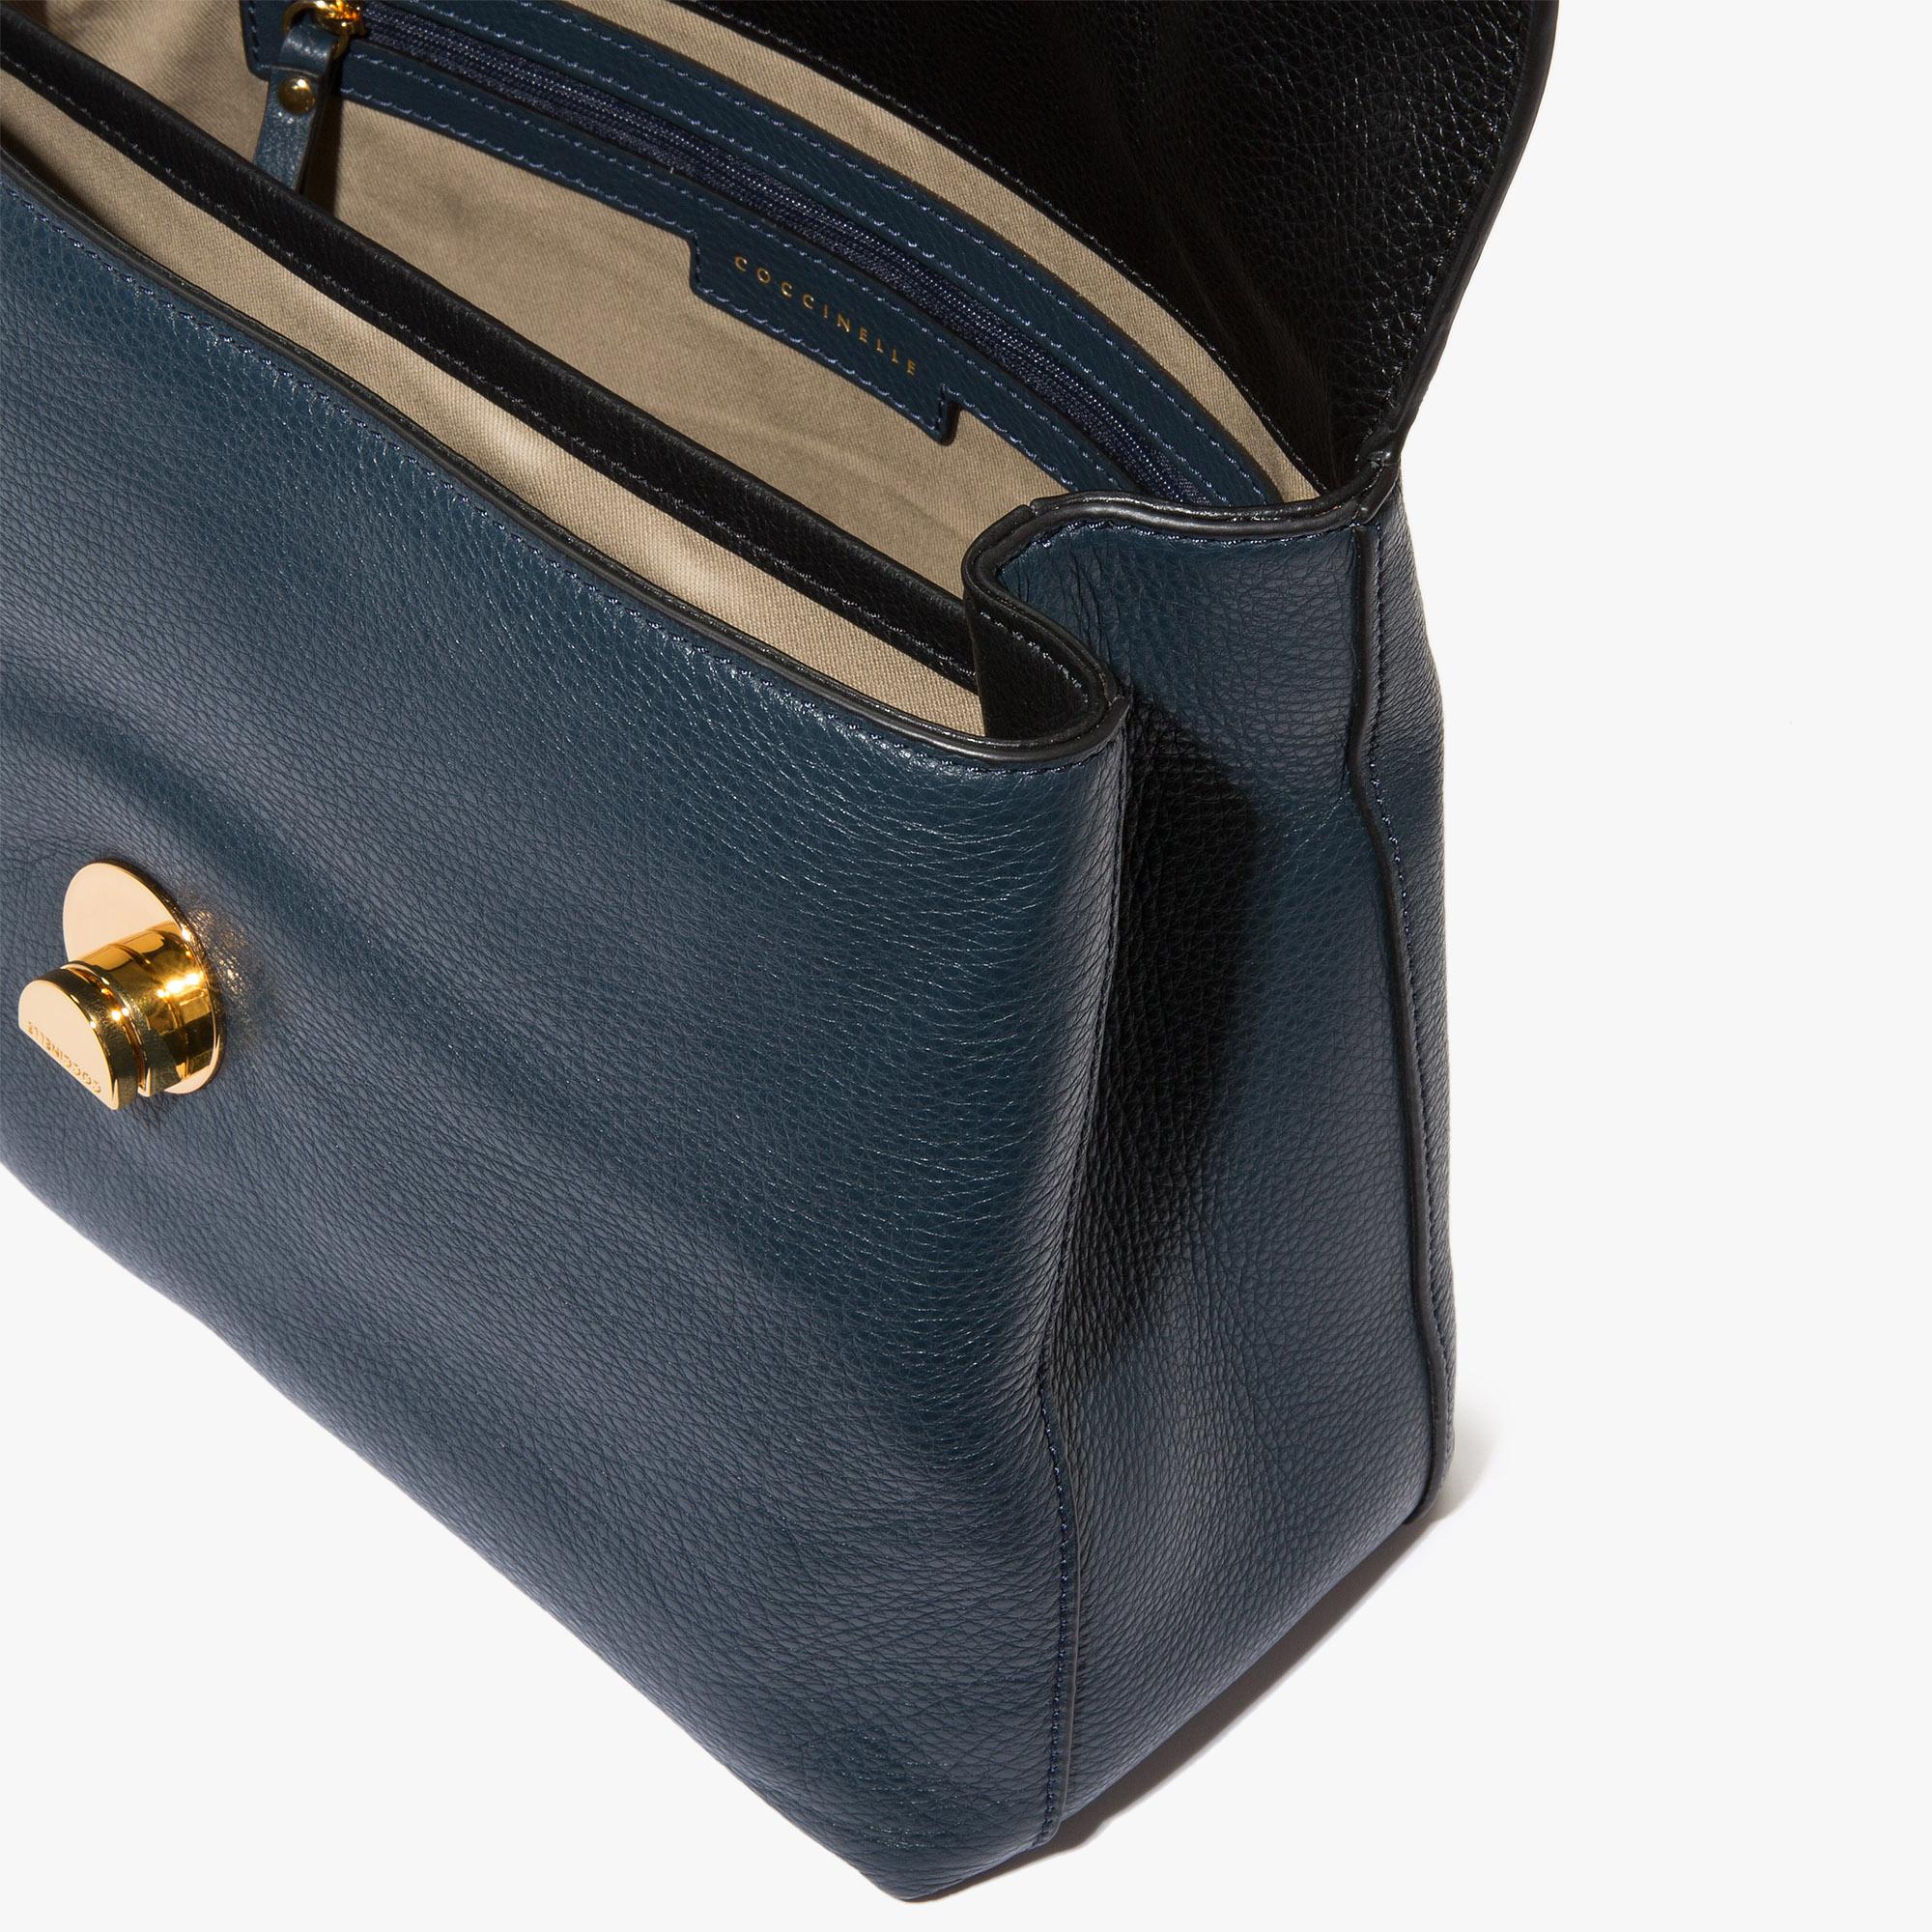 Coccinelle Liya leather handbag